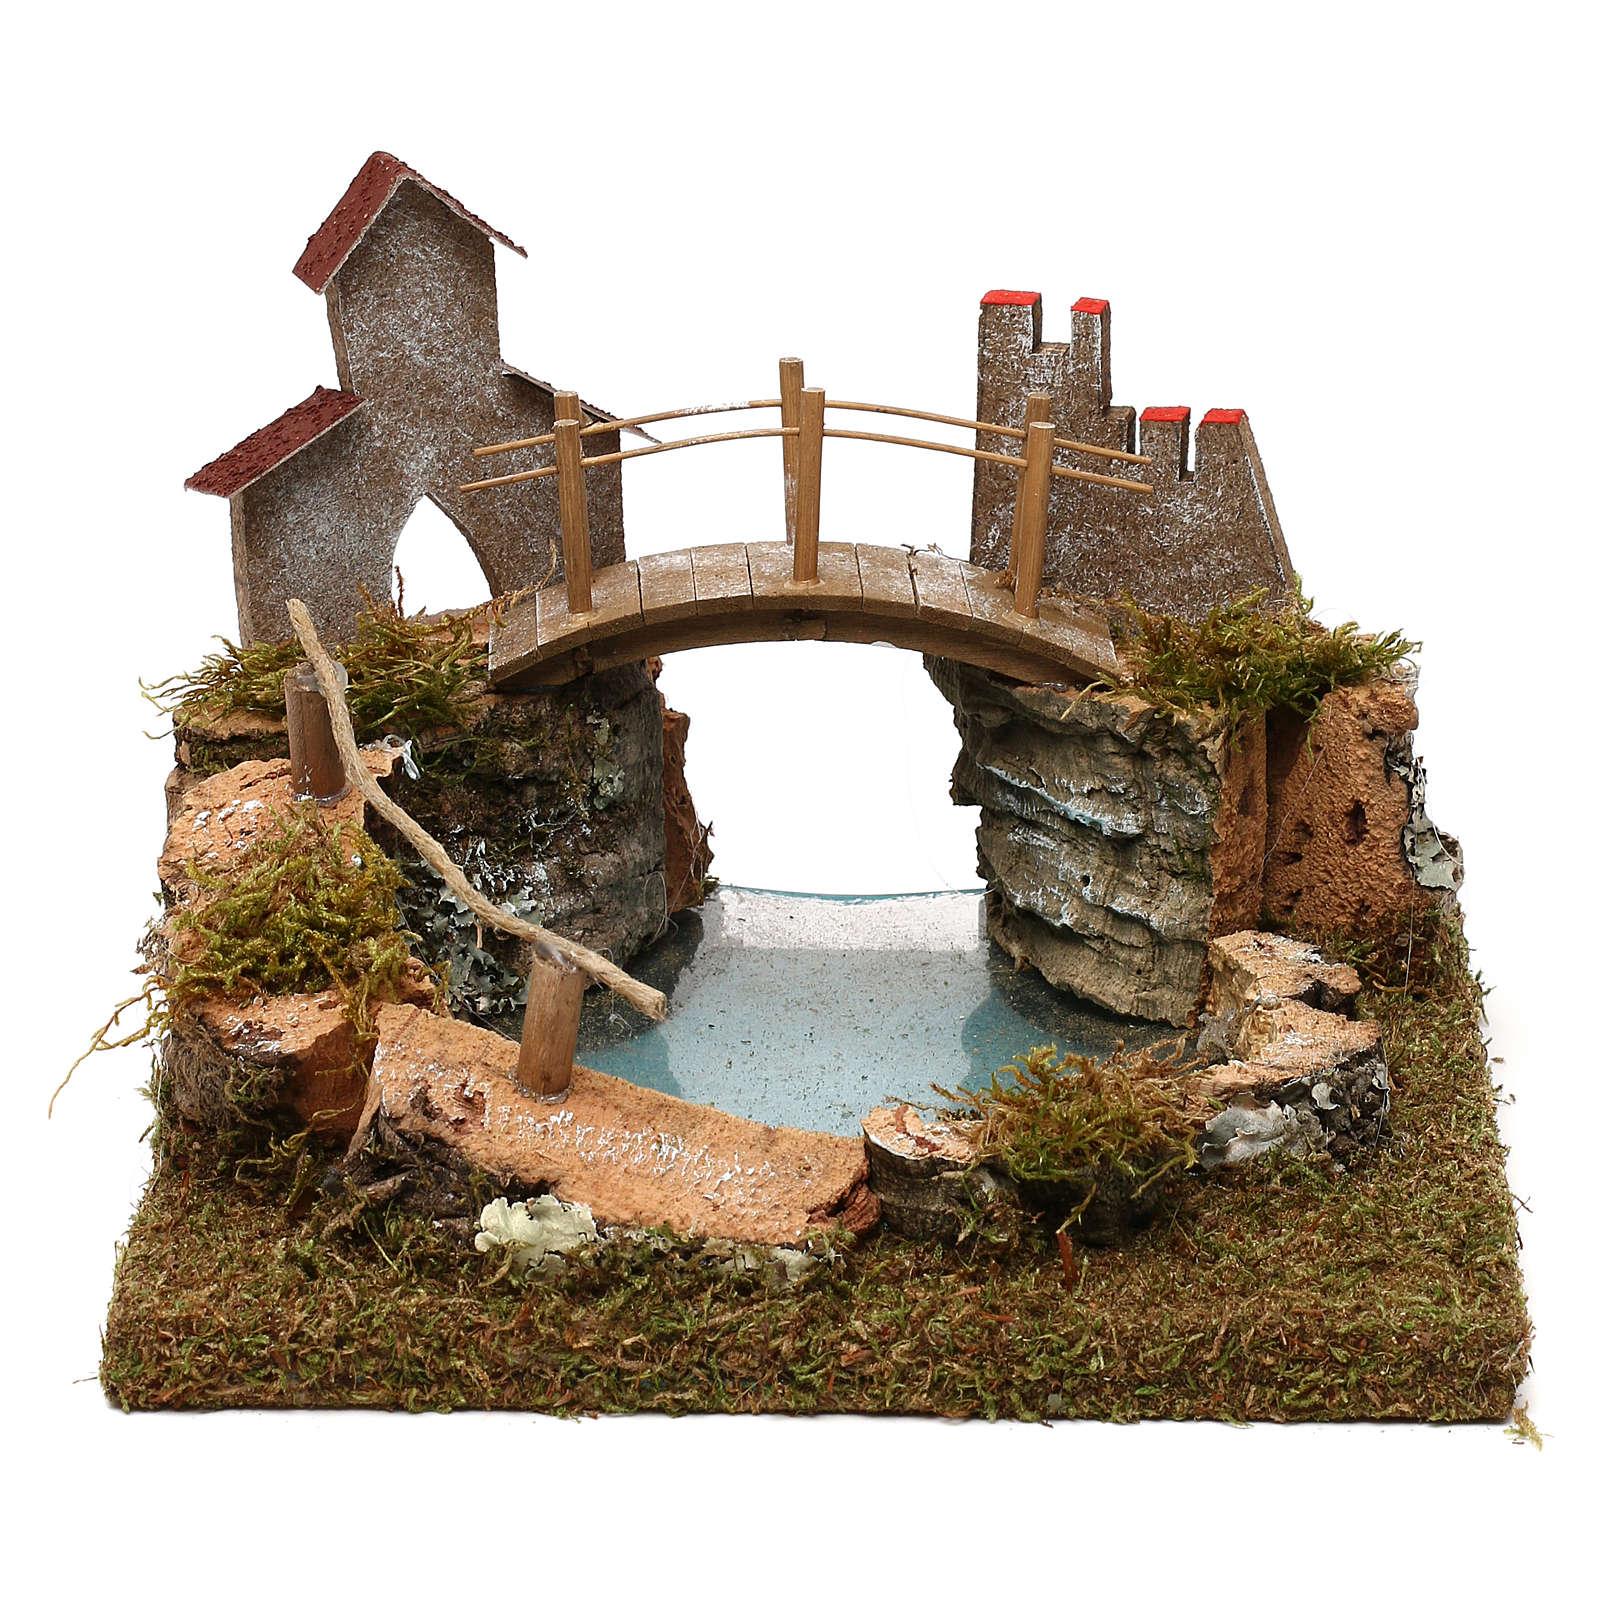 Nativity setting, mountain lake with bridge and animals 4